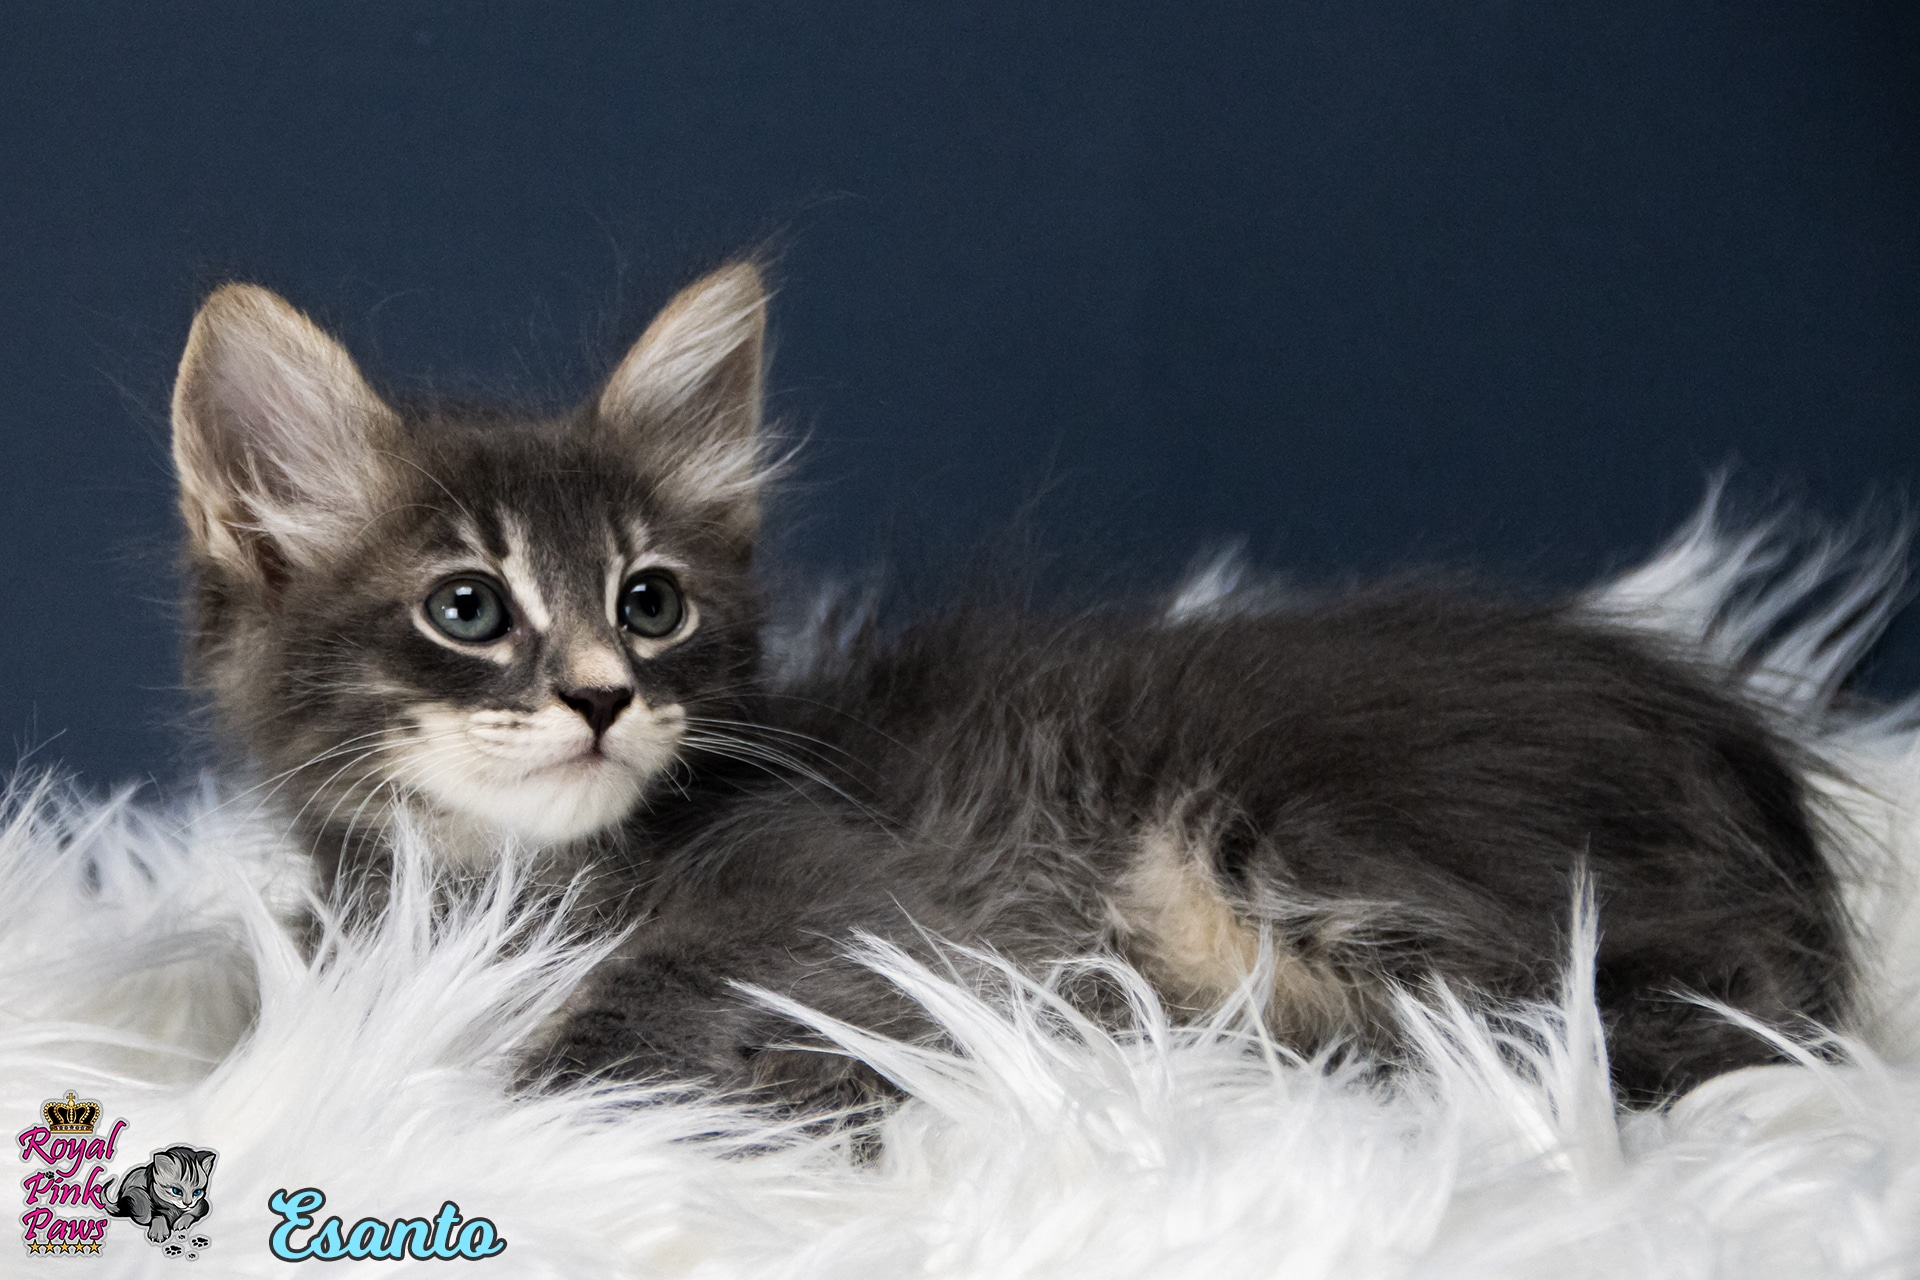 Sibirische Katze - Esanto Royal Pink Paws